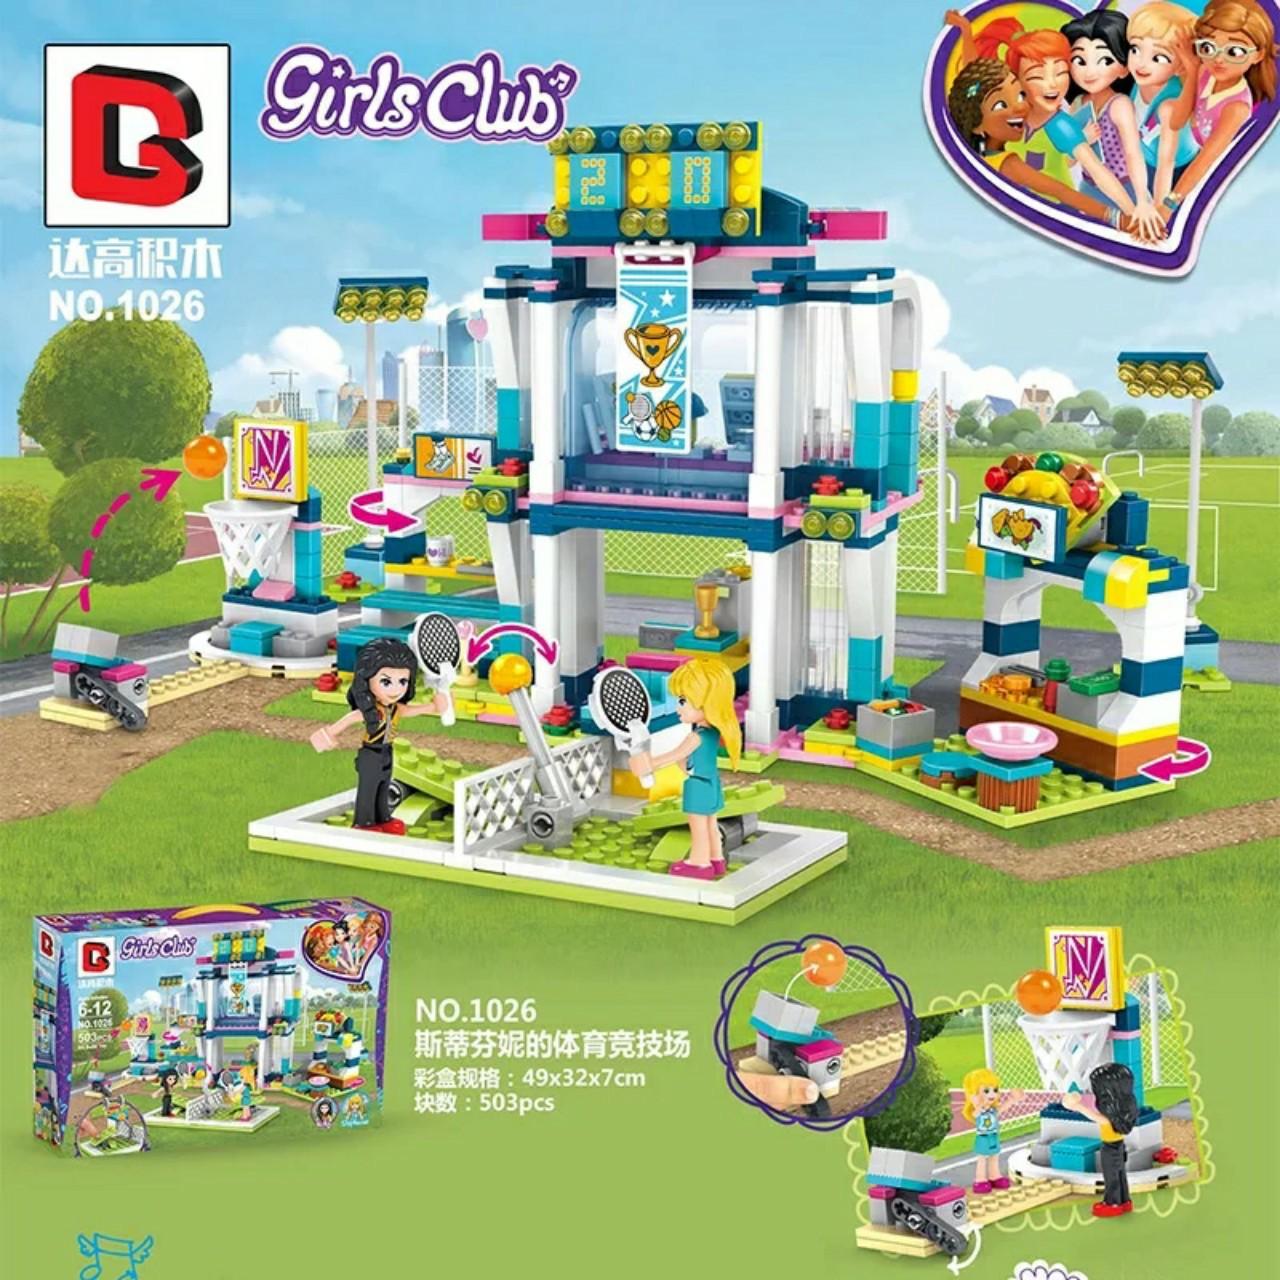 Lego Friends đấu trường thể thao của stephanie - BG build 1026